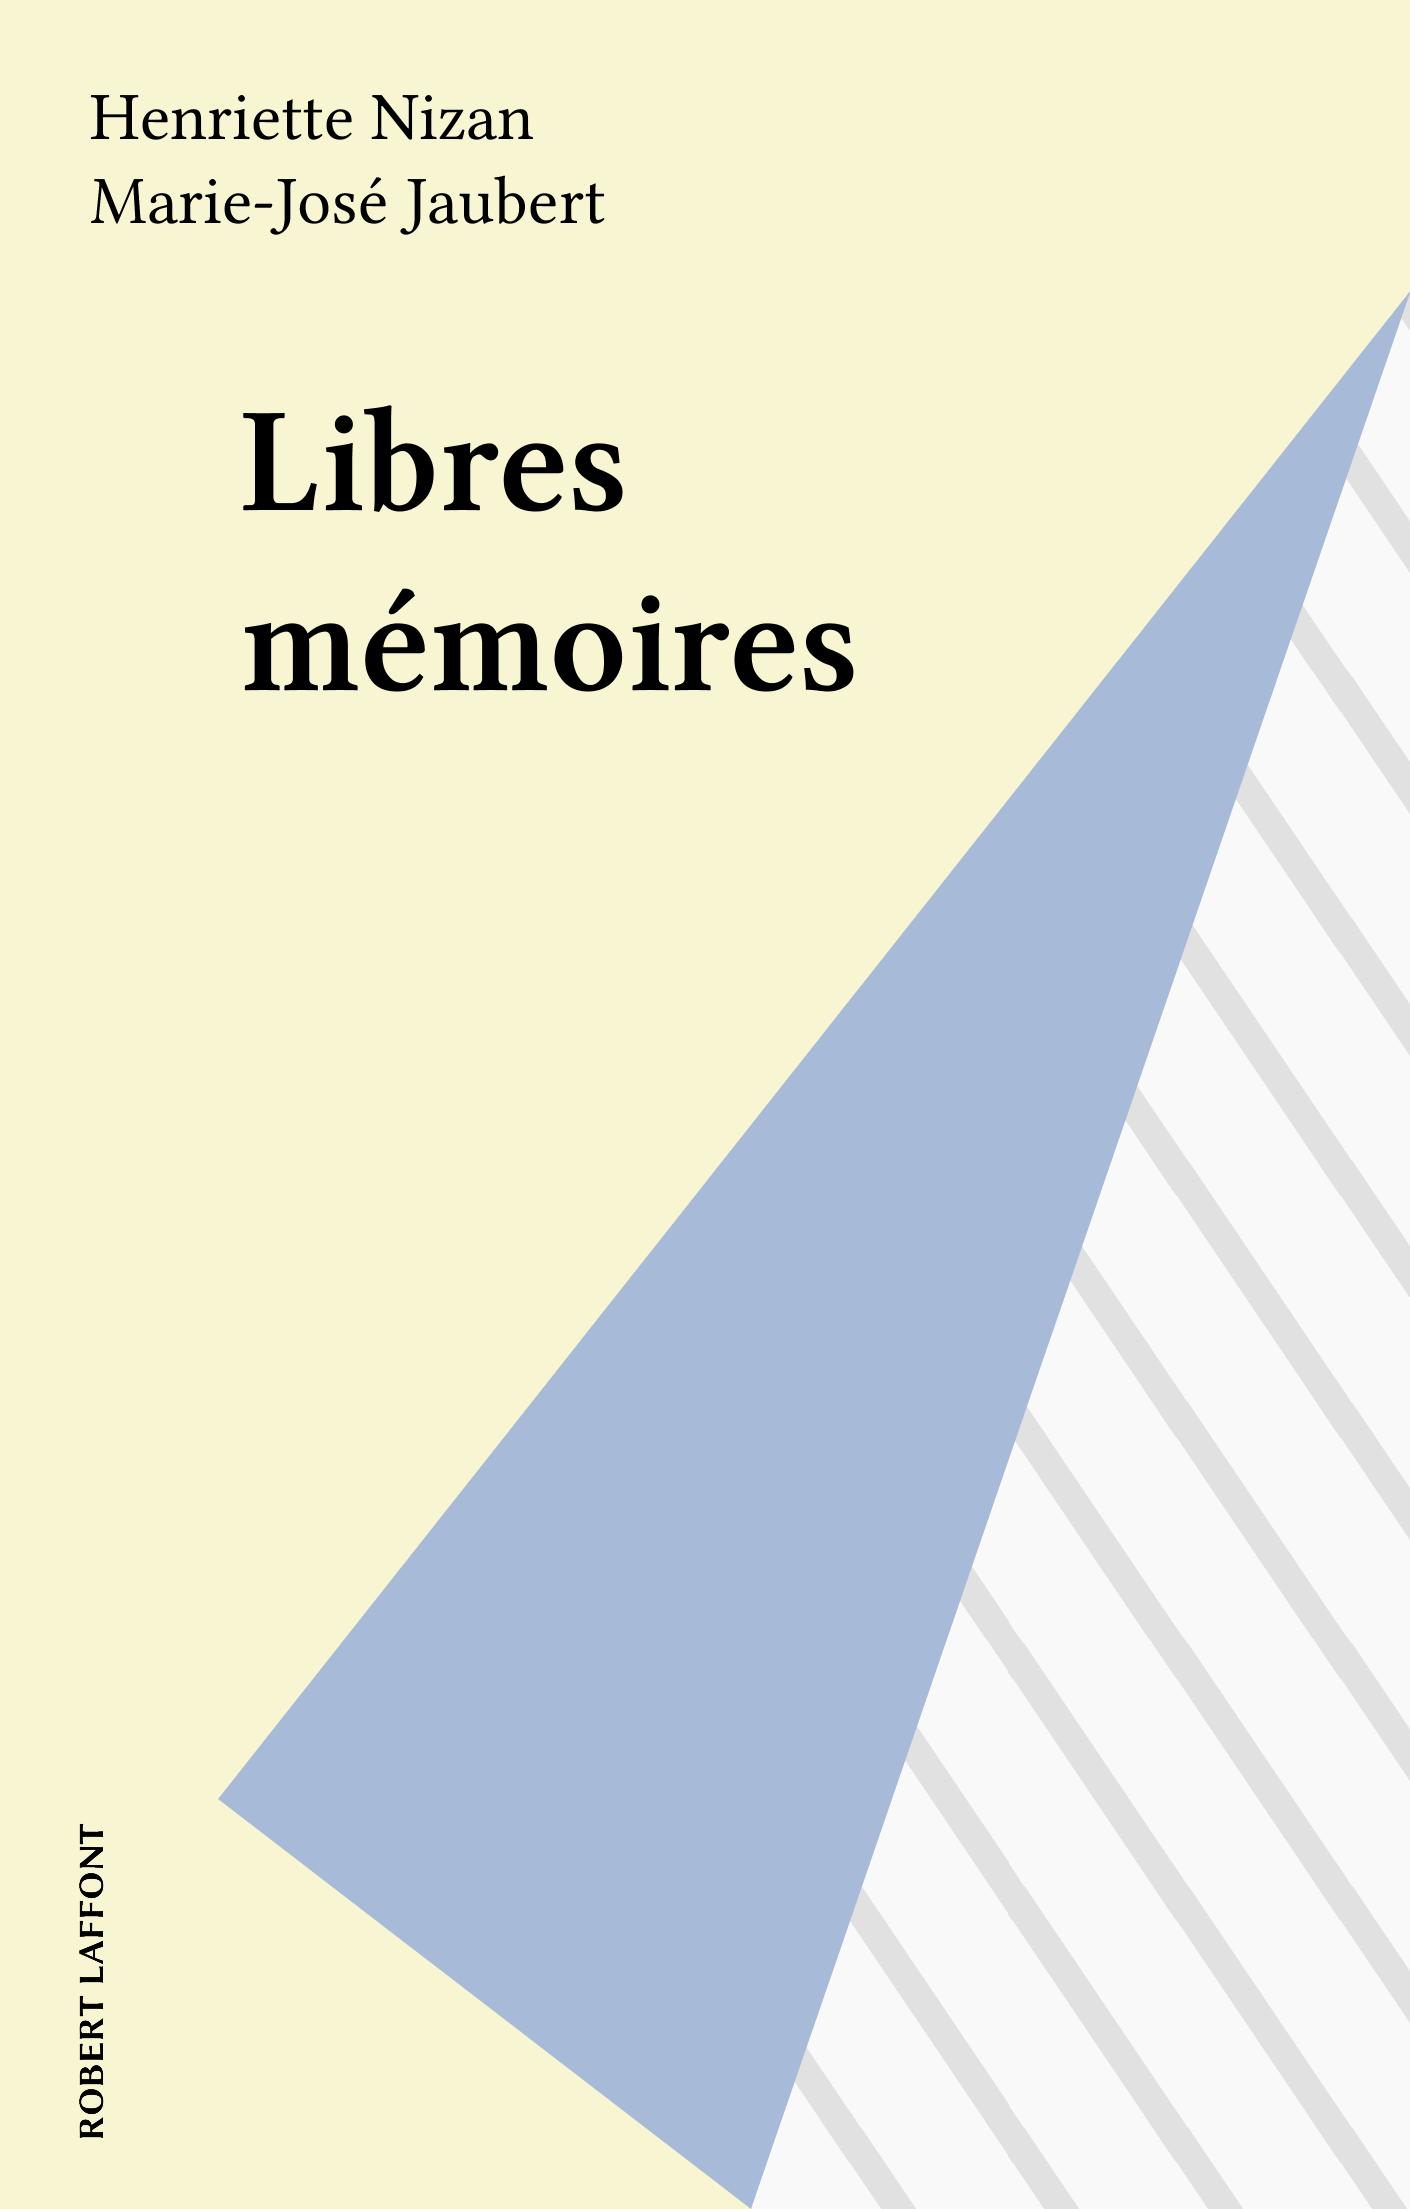 Libres mémoires